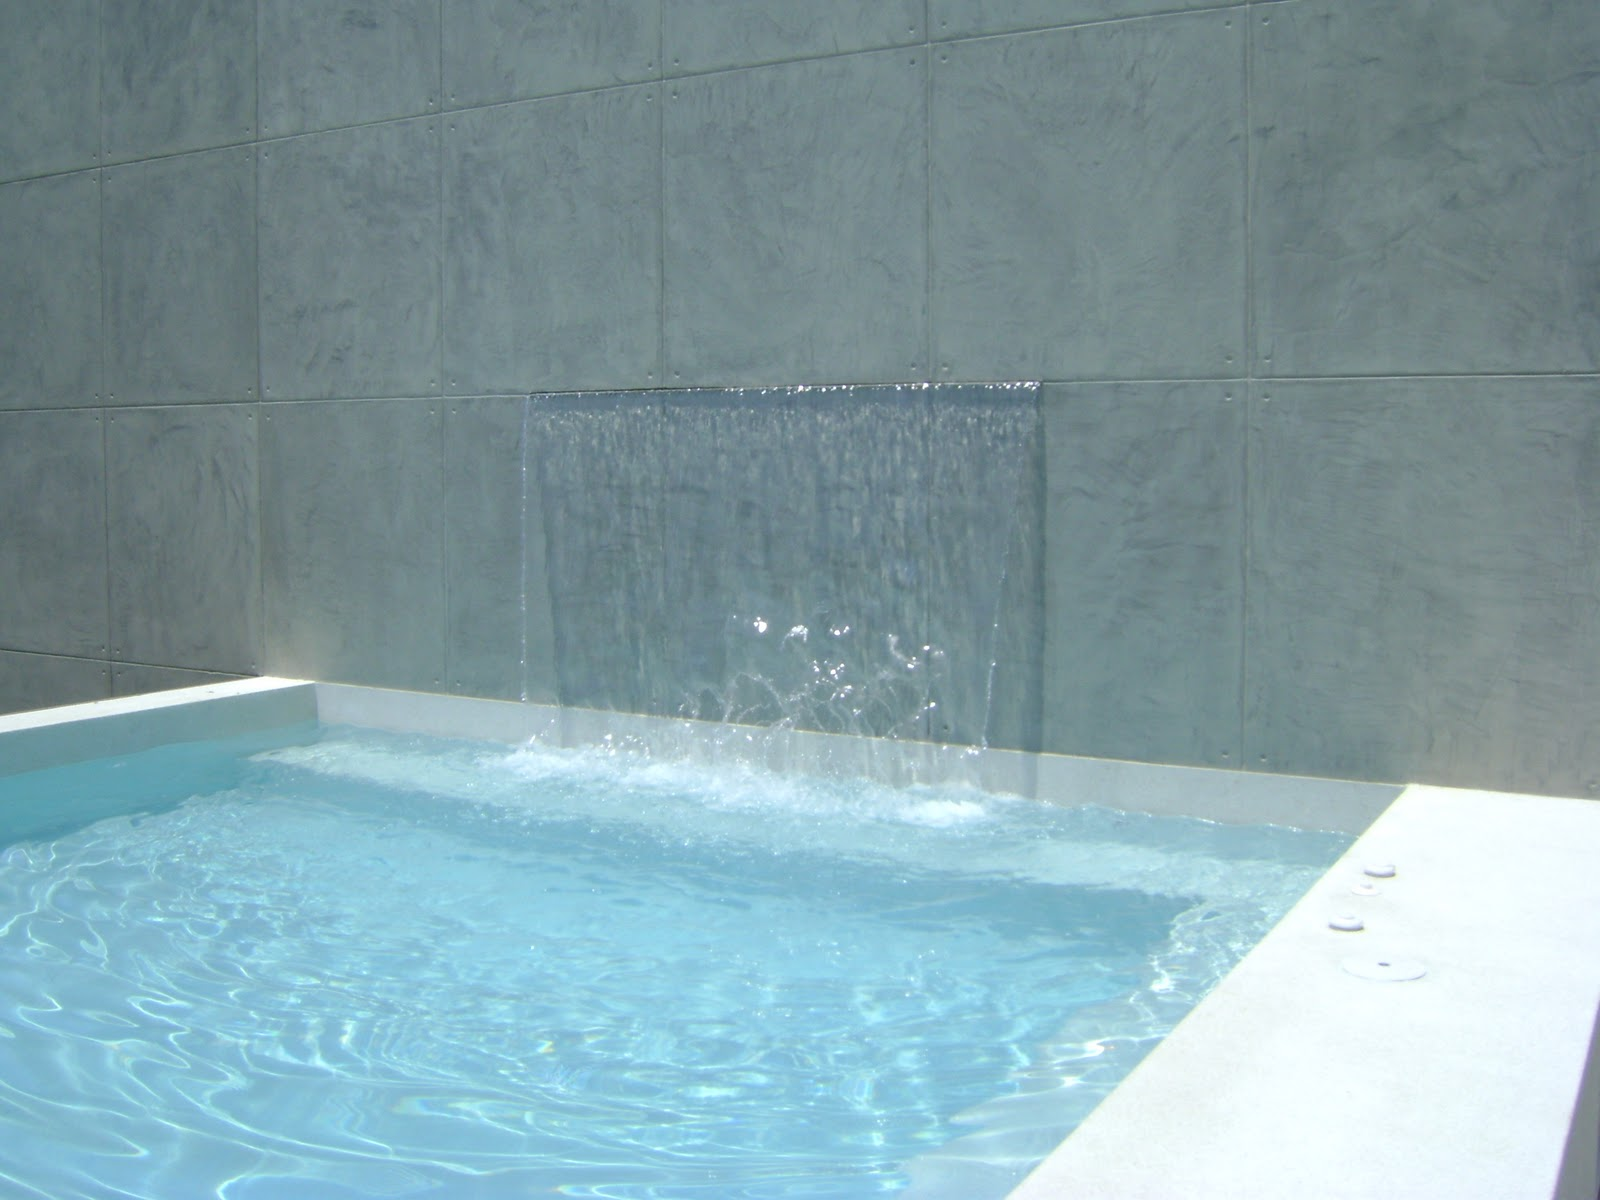 Apliconsac reparaci n de piscinas for Reparacion de piscinas